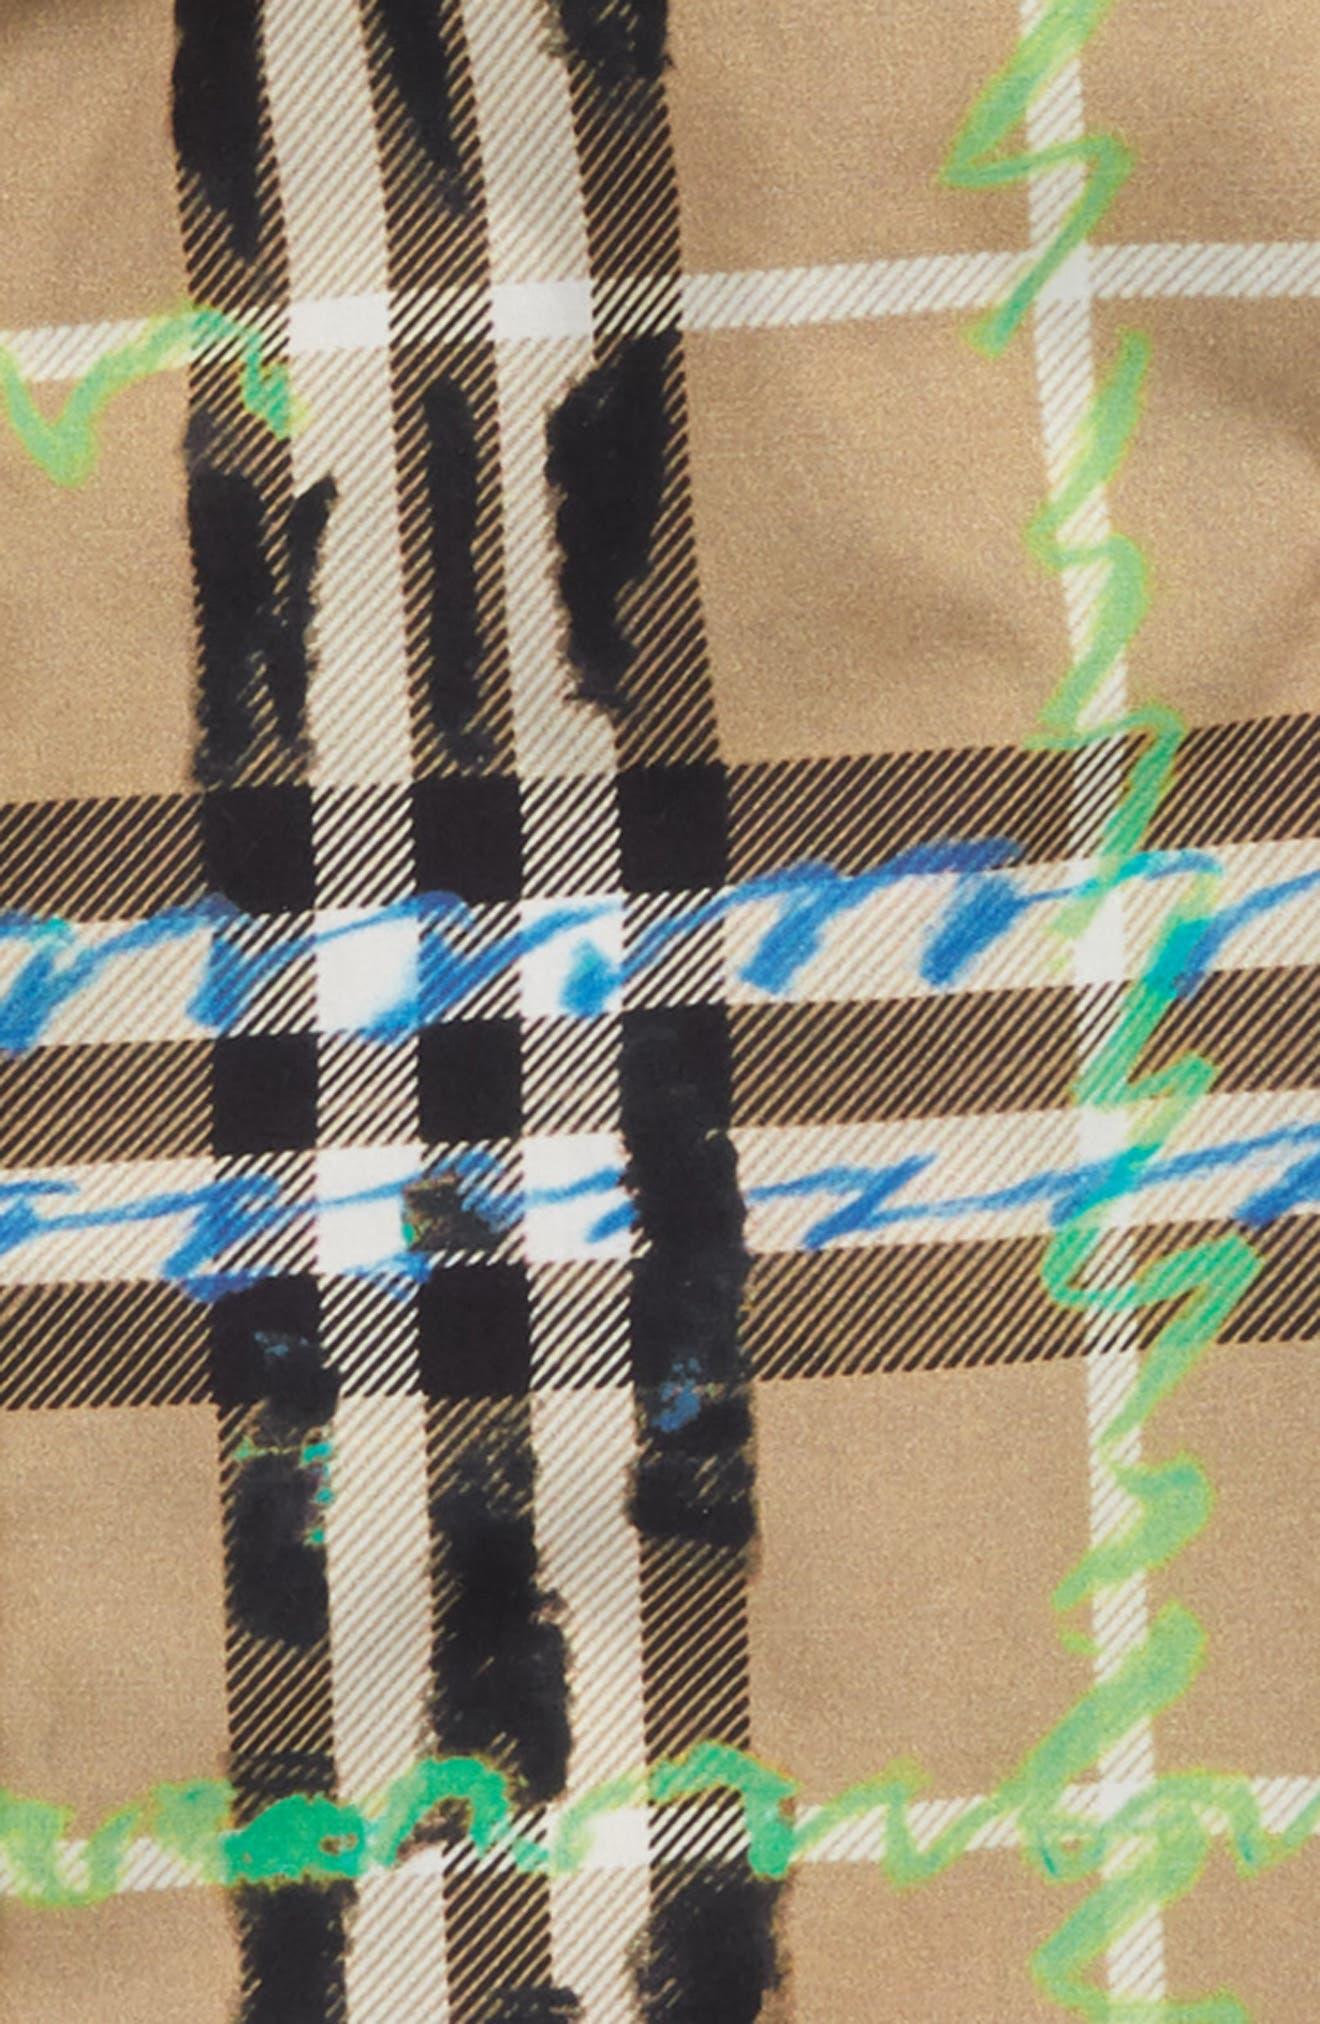 Clarkey Scribble Plaid Woven Shirt,                             Alternate thumbnail 2, color,                             Bright Blue